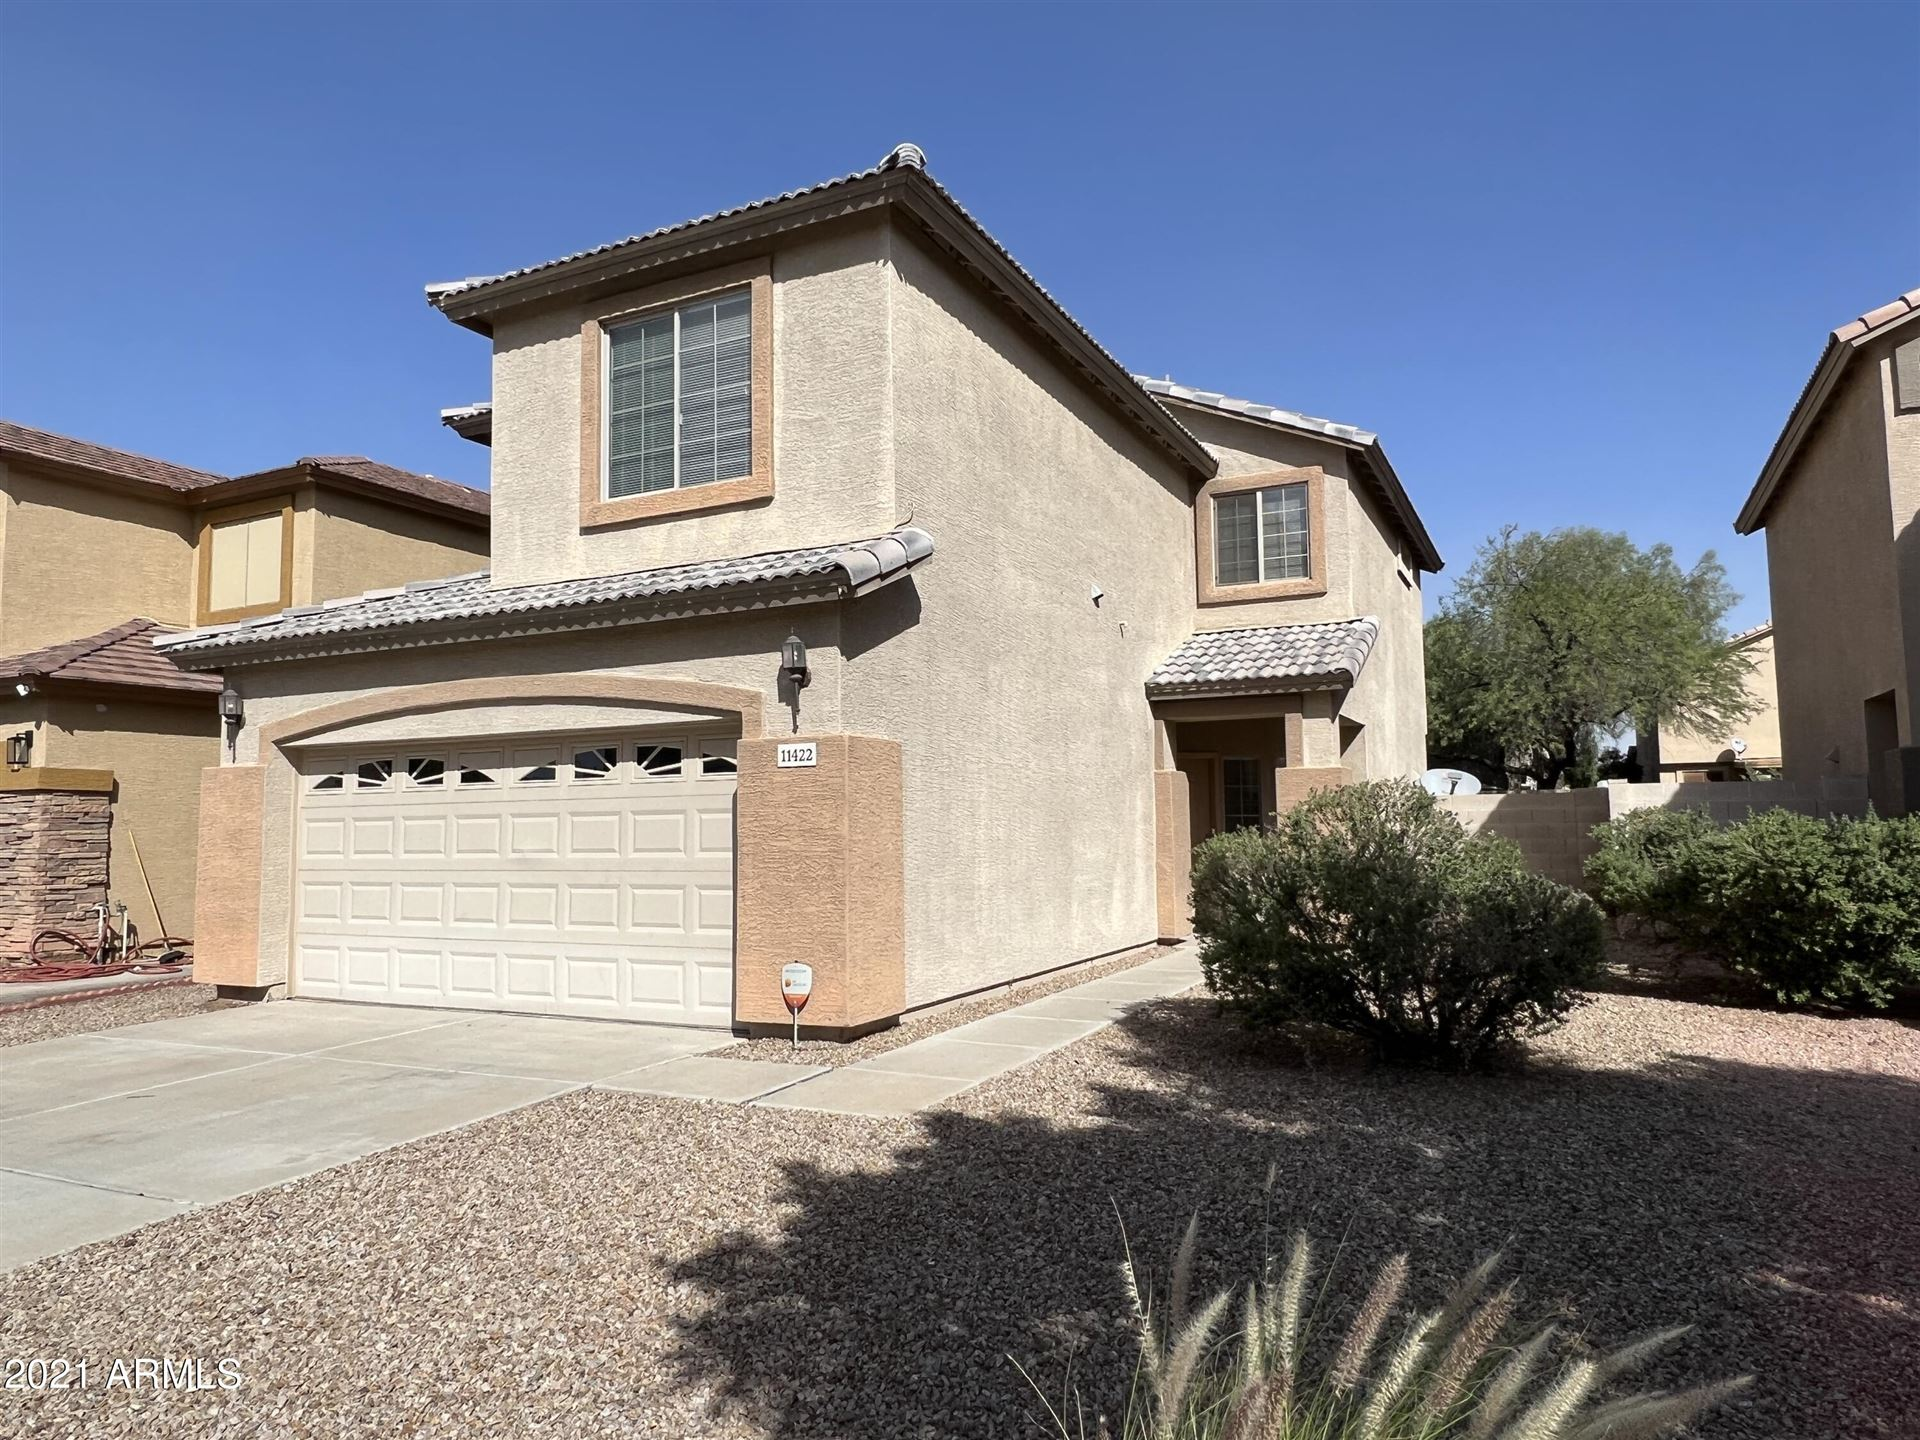 Photo of 11422 W COCOPAH Street, Avondale, AZ 85323 (MLS # 6306864)